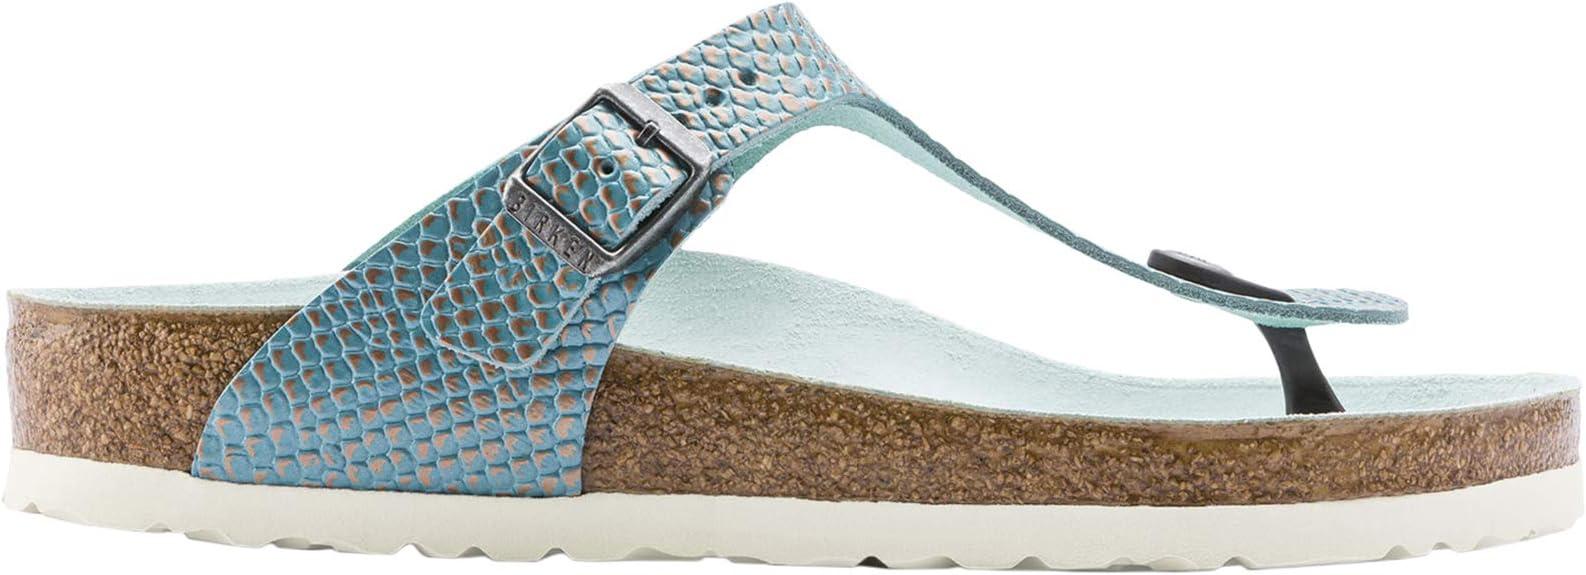 Birkenstock Gizeh NL Mermaid Aqua: : Chaussures et Sacs